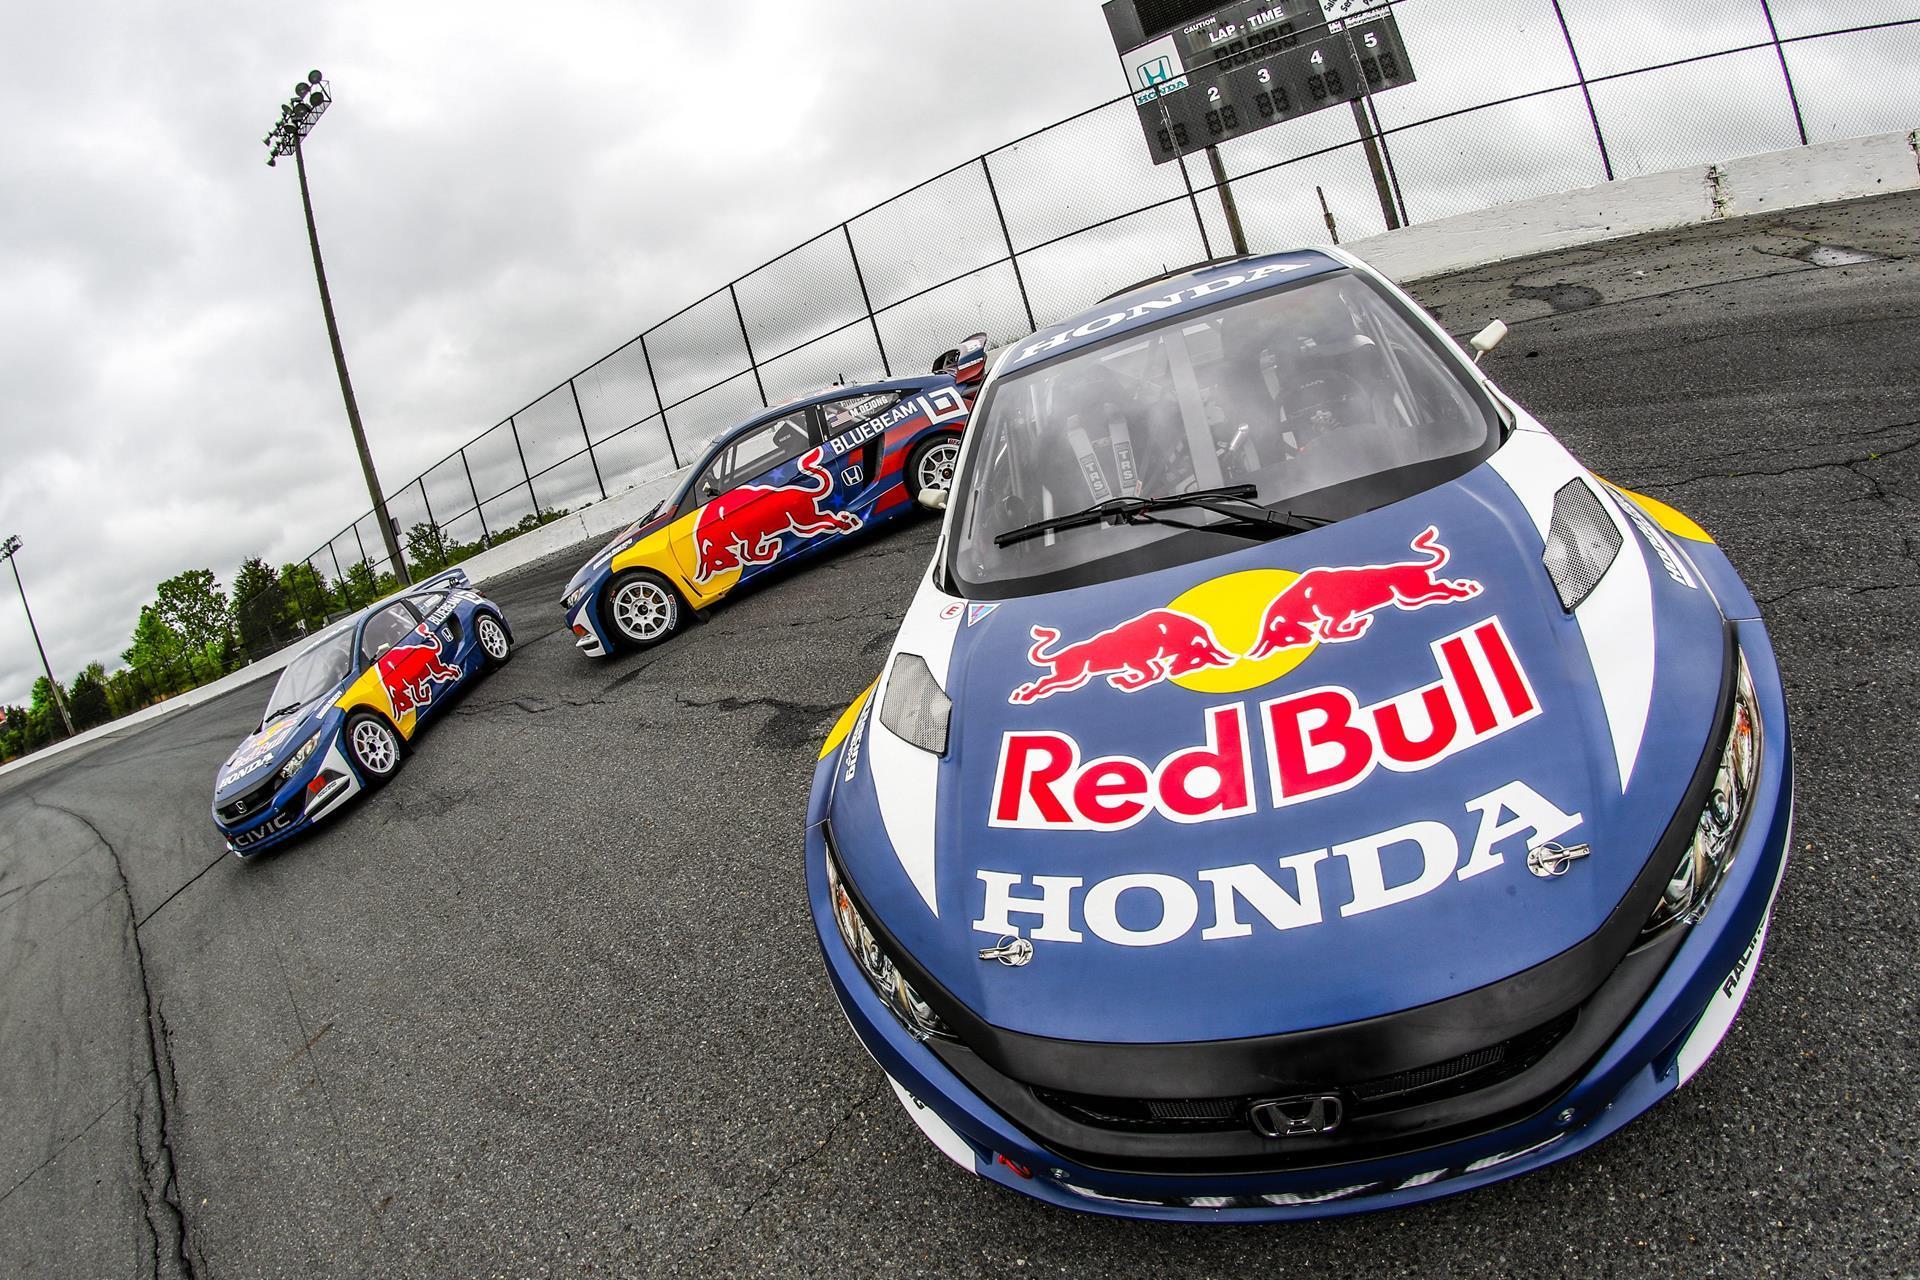 2016 honda civic coupe red bull global rallycross race car debuts in - 2016 Honda Civic Coupe Red Bull Global Rallycross Race Car Debuts In 53